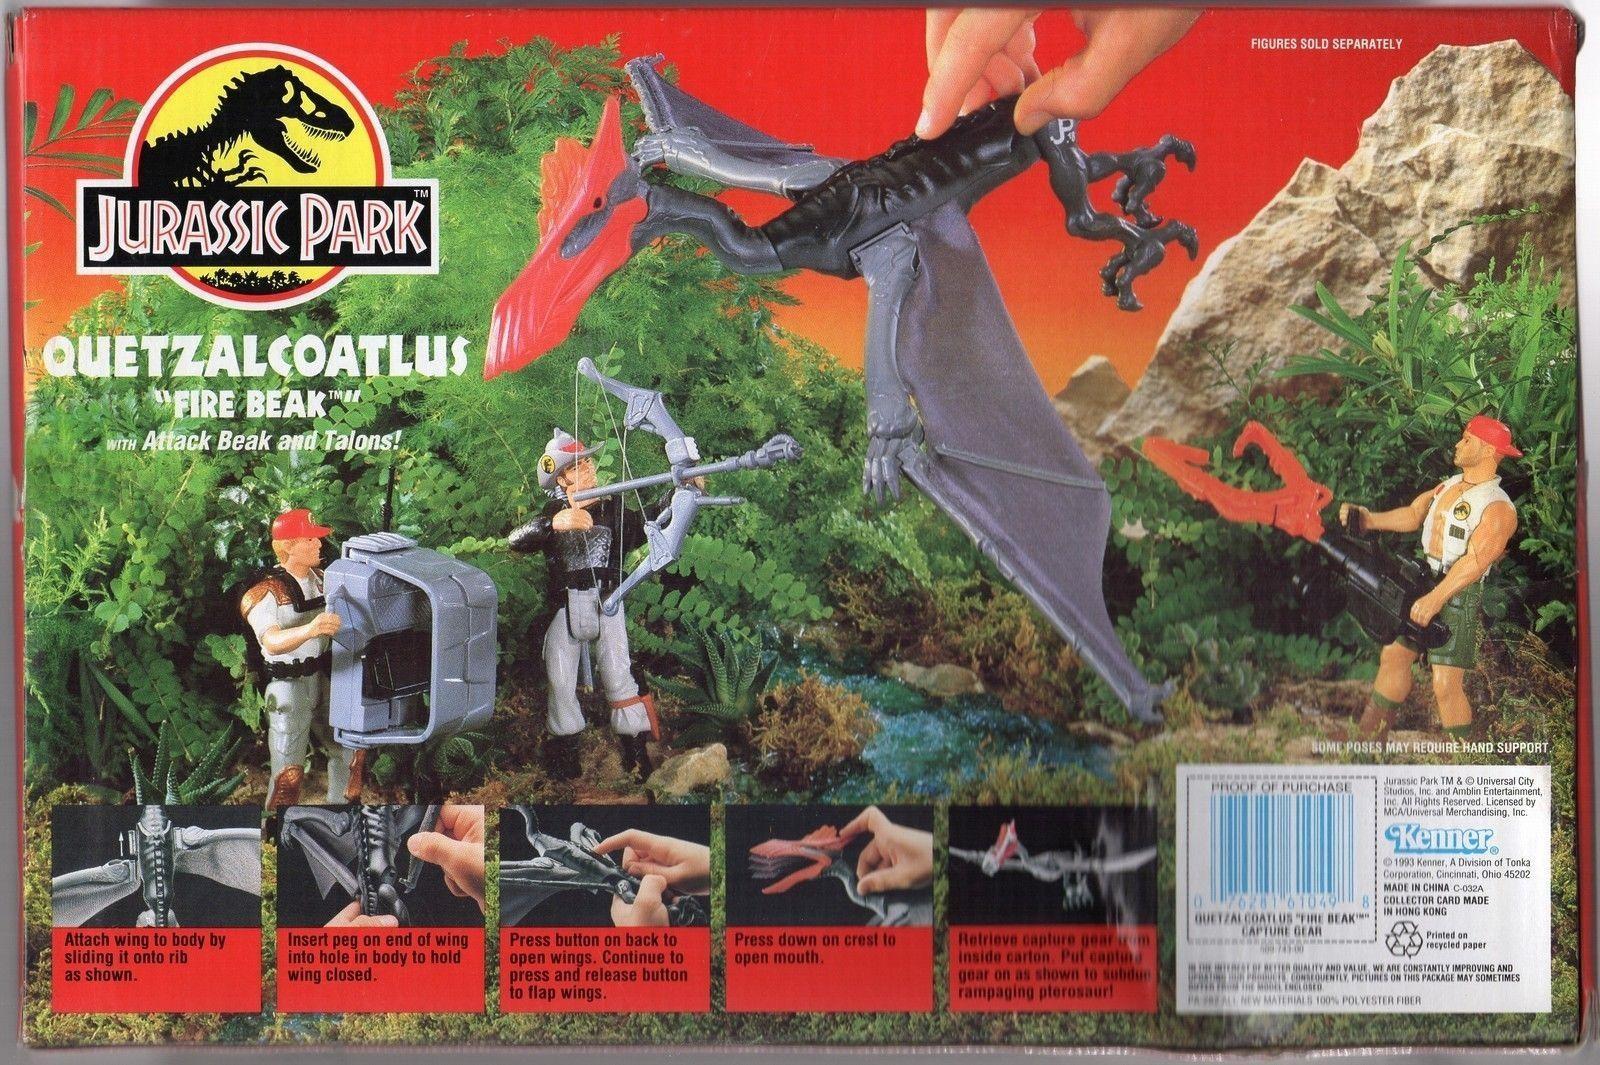 quetzalcoatlus-firebeak-jurassic-park_1_dd110d8df4efe9258b9c306ac827ef1b.jpg